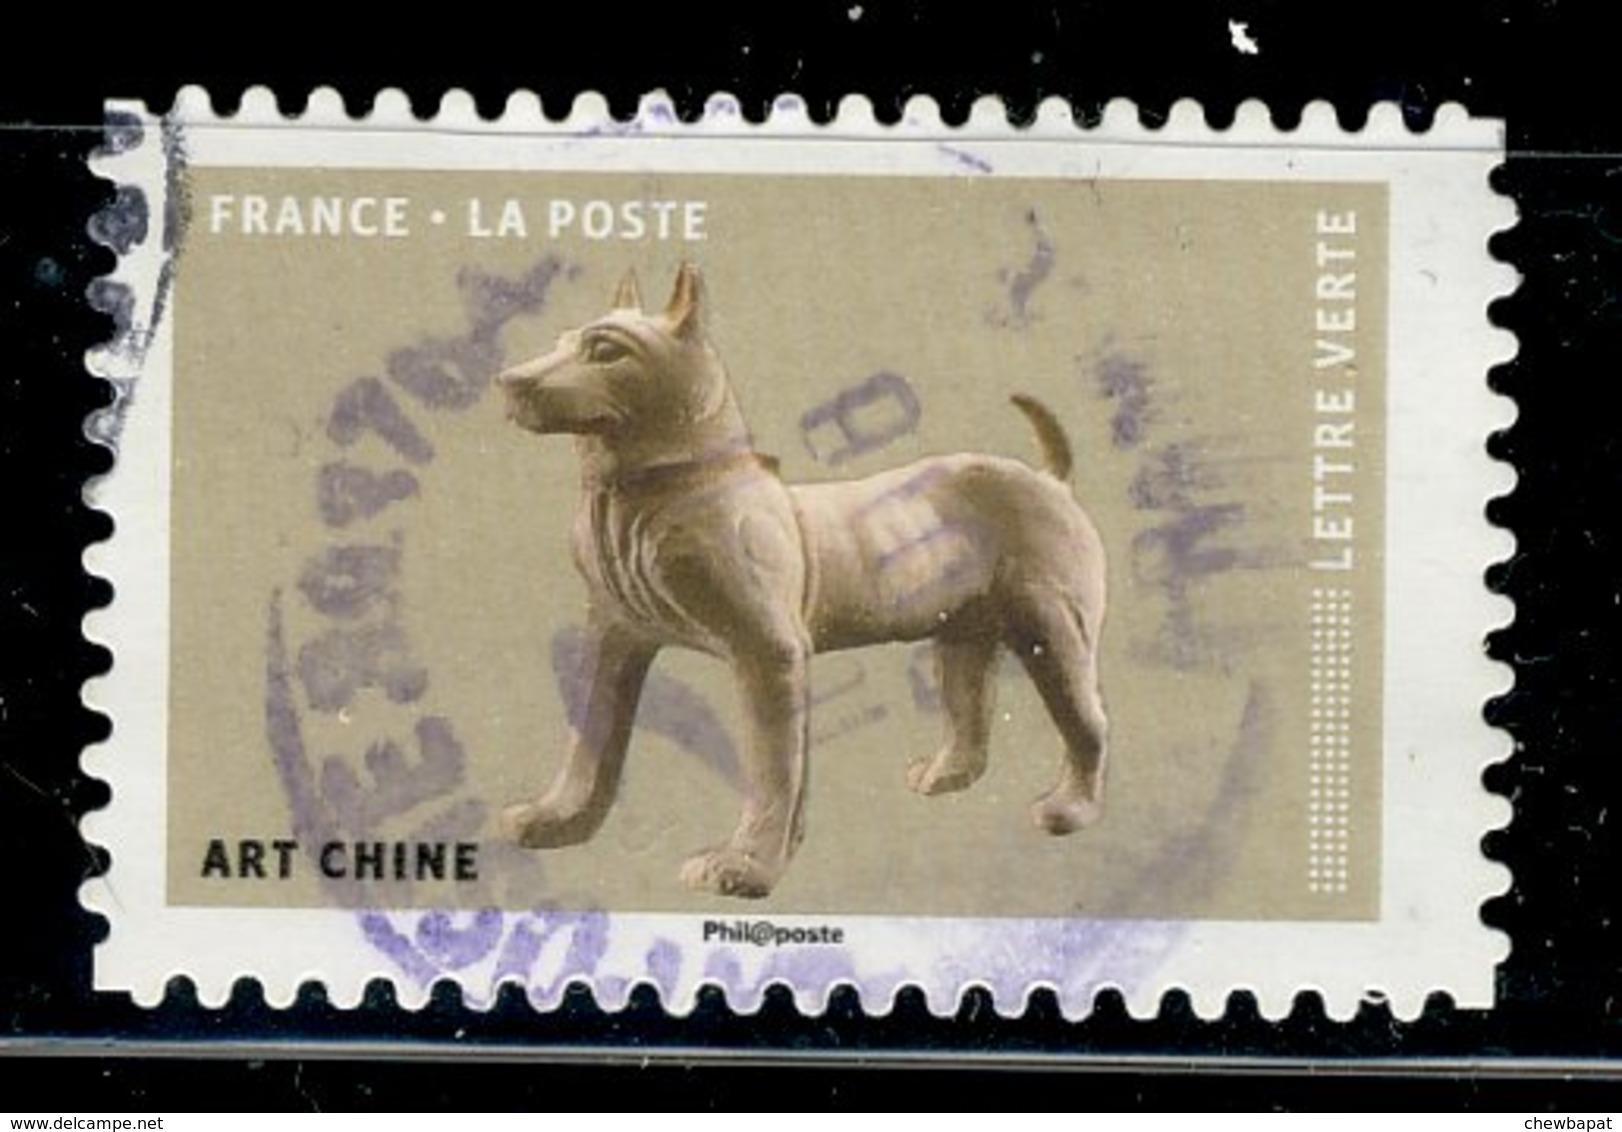 France 2018 - Oblitéré Used - Y&T N° AA 1524 - Art Chine - France